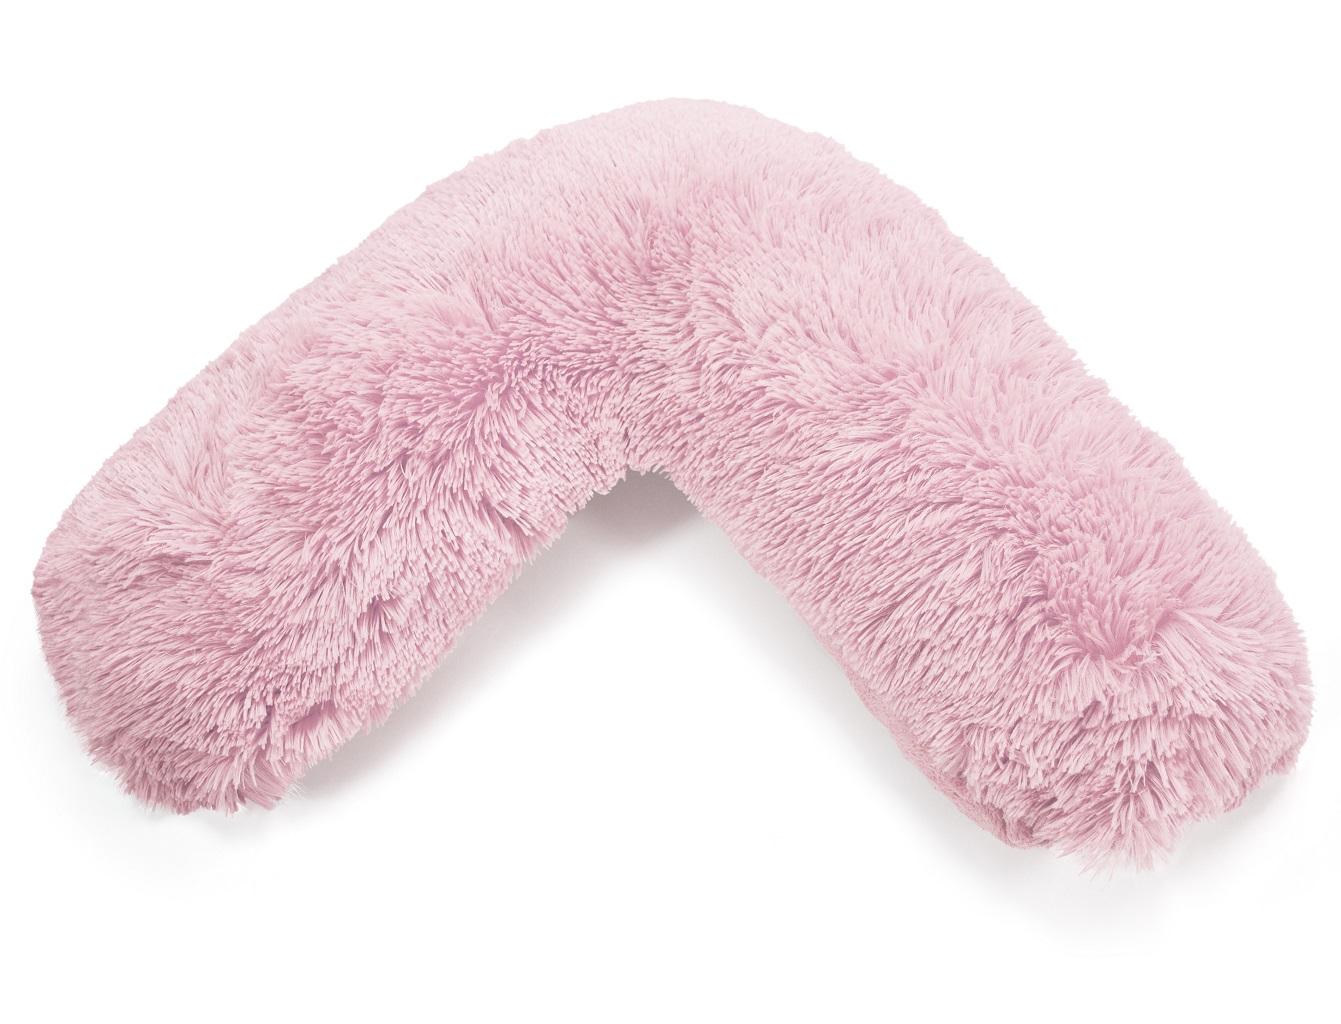 TEDDY CUDDLES V SHAPED Neck Back Pillow Cushion Case Pregnancy V Cover Only